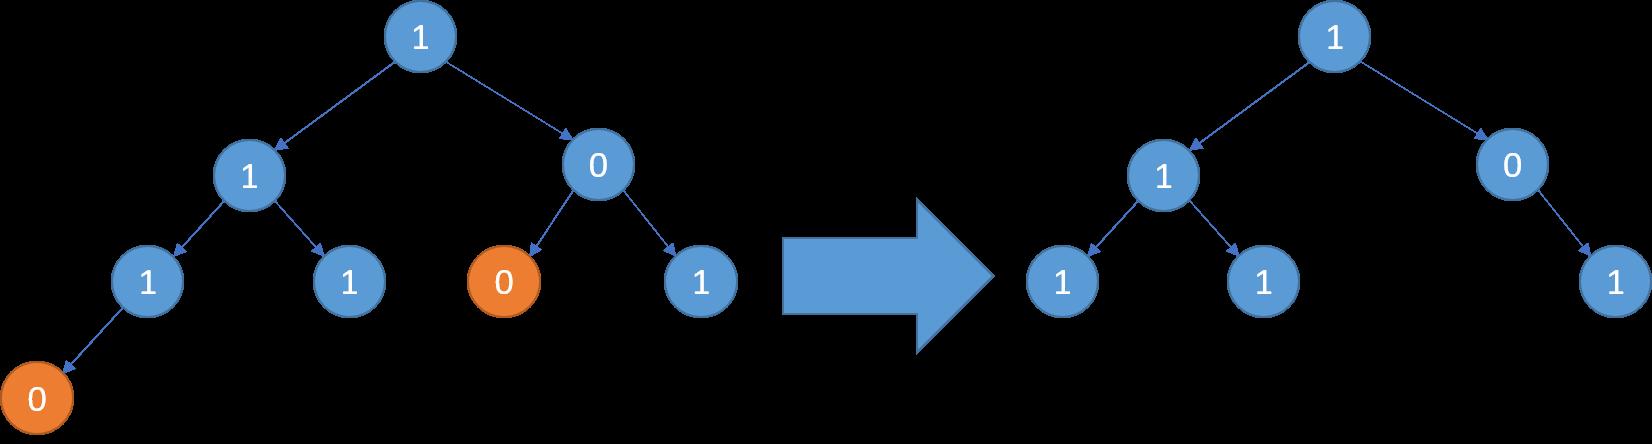 Binary Tree Pruning